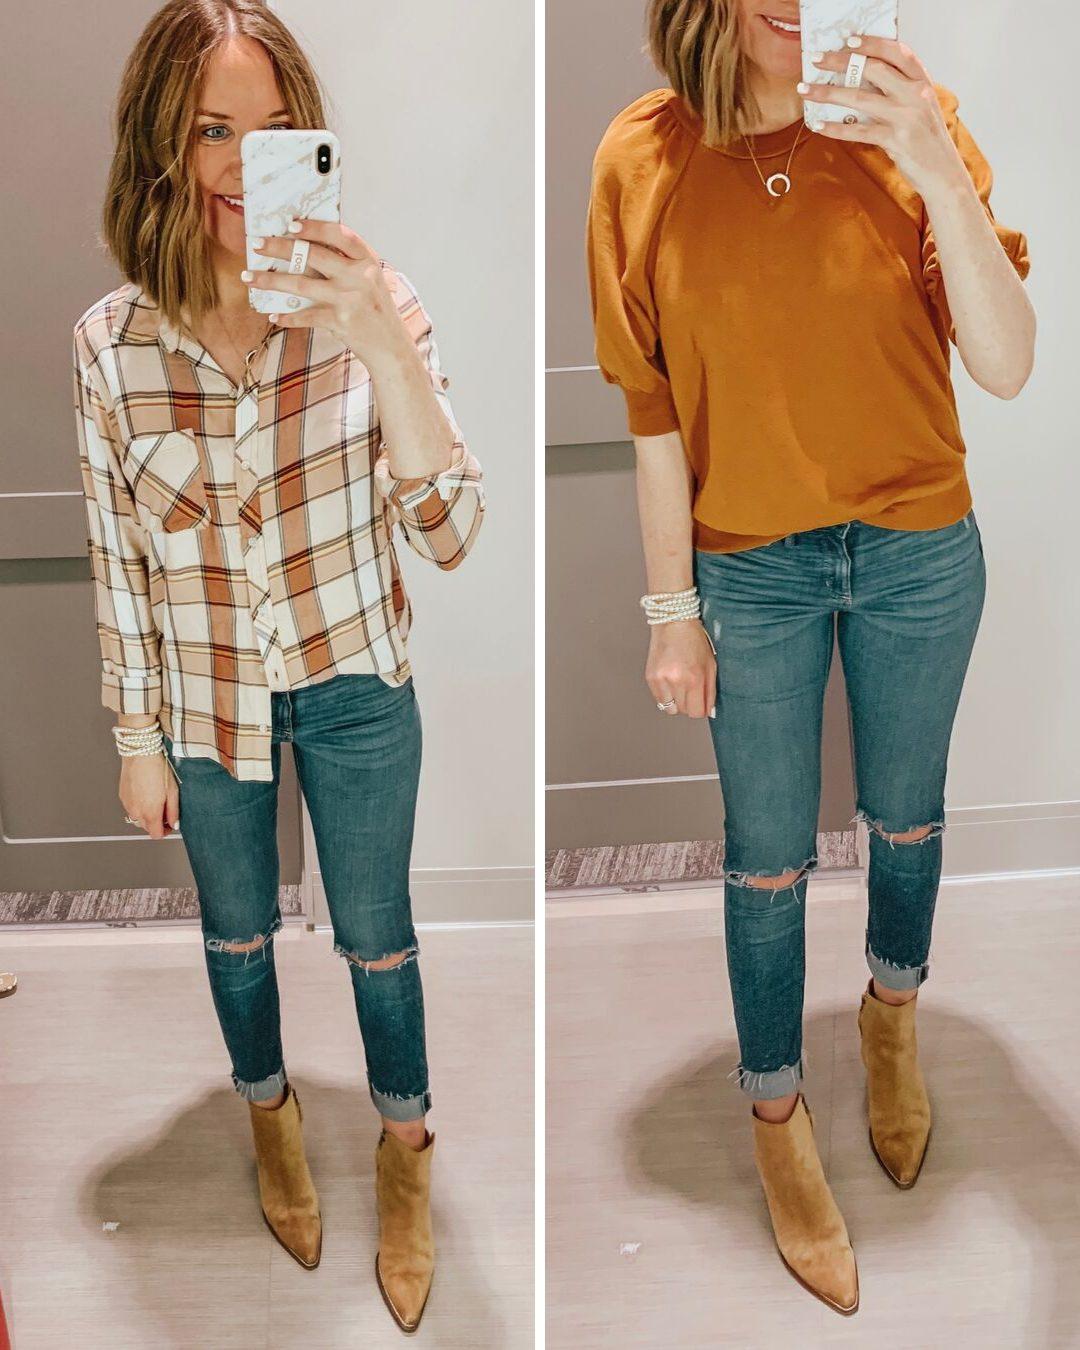 Target fall fashion preview 2019 plaid shirt, Universal Thread jeans